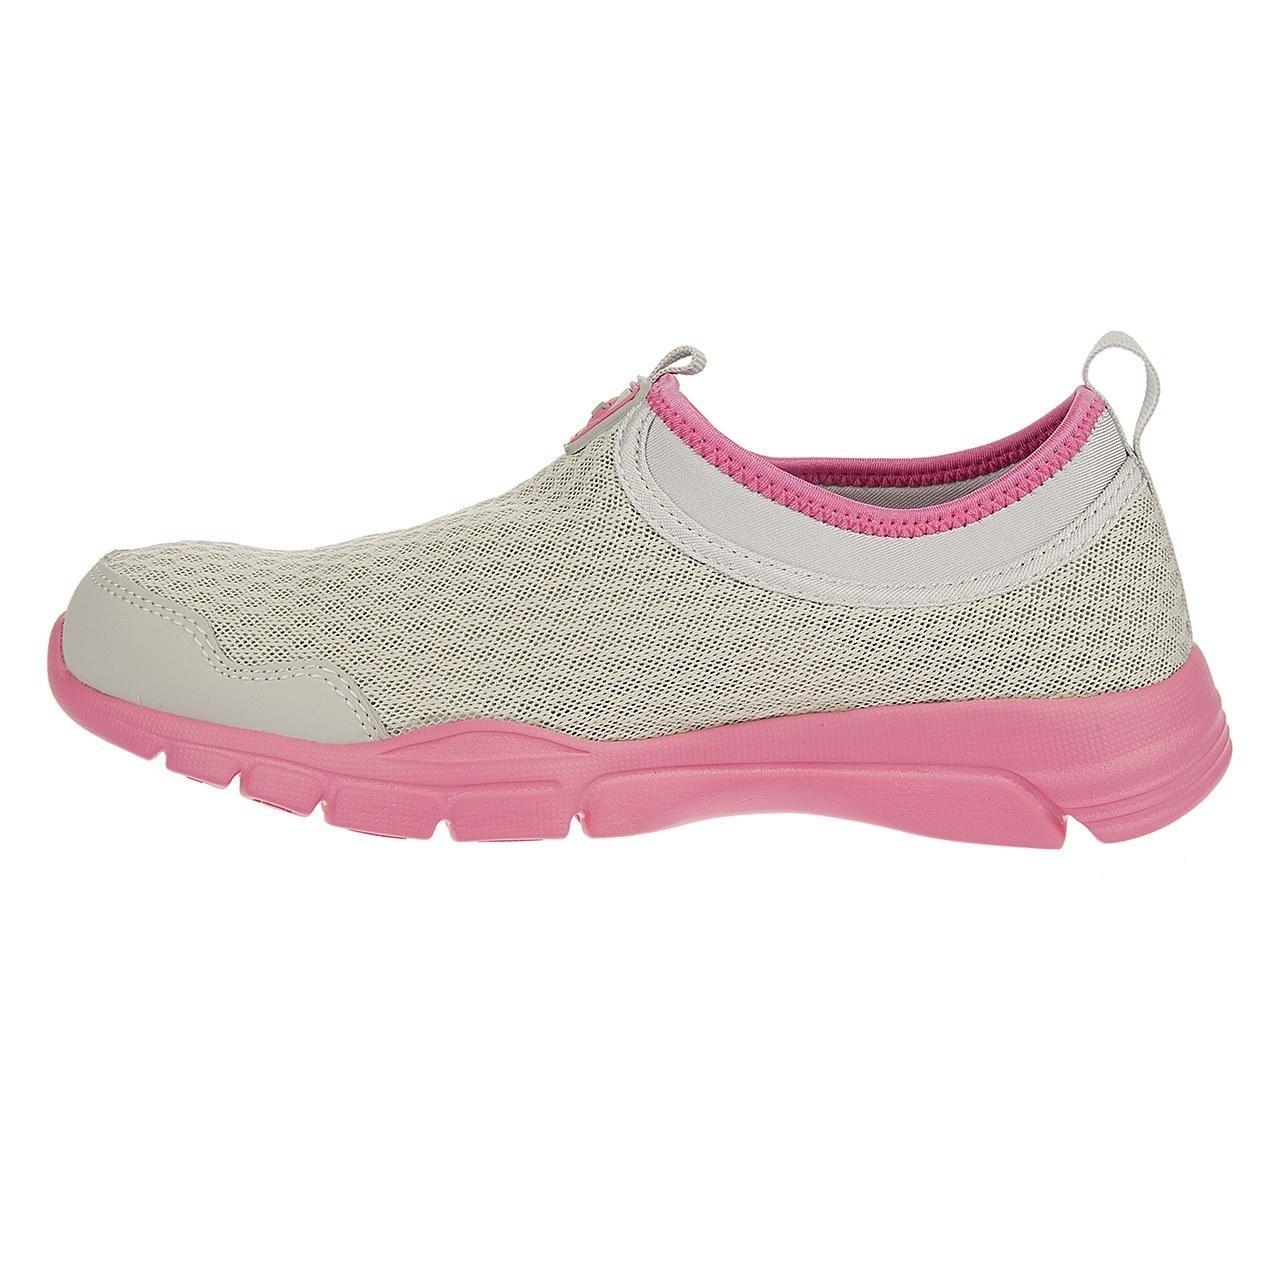 کفش مخصوص دويدن زنانه 361 درجه مدل 24423 | Model 24423 Running Shoes By 361 Degrees For Women